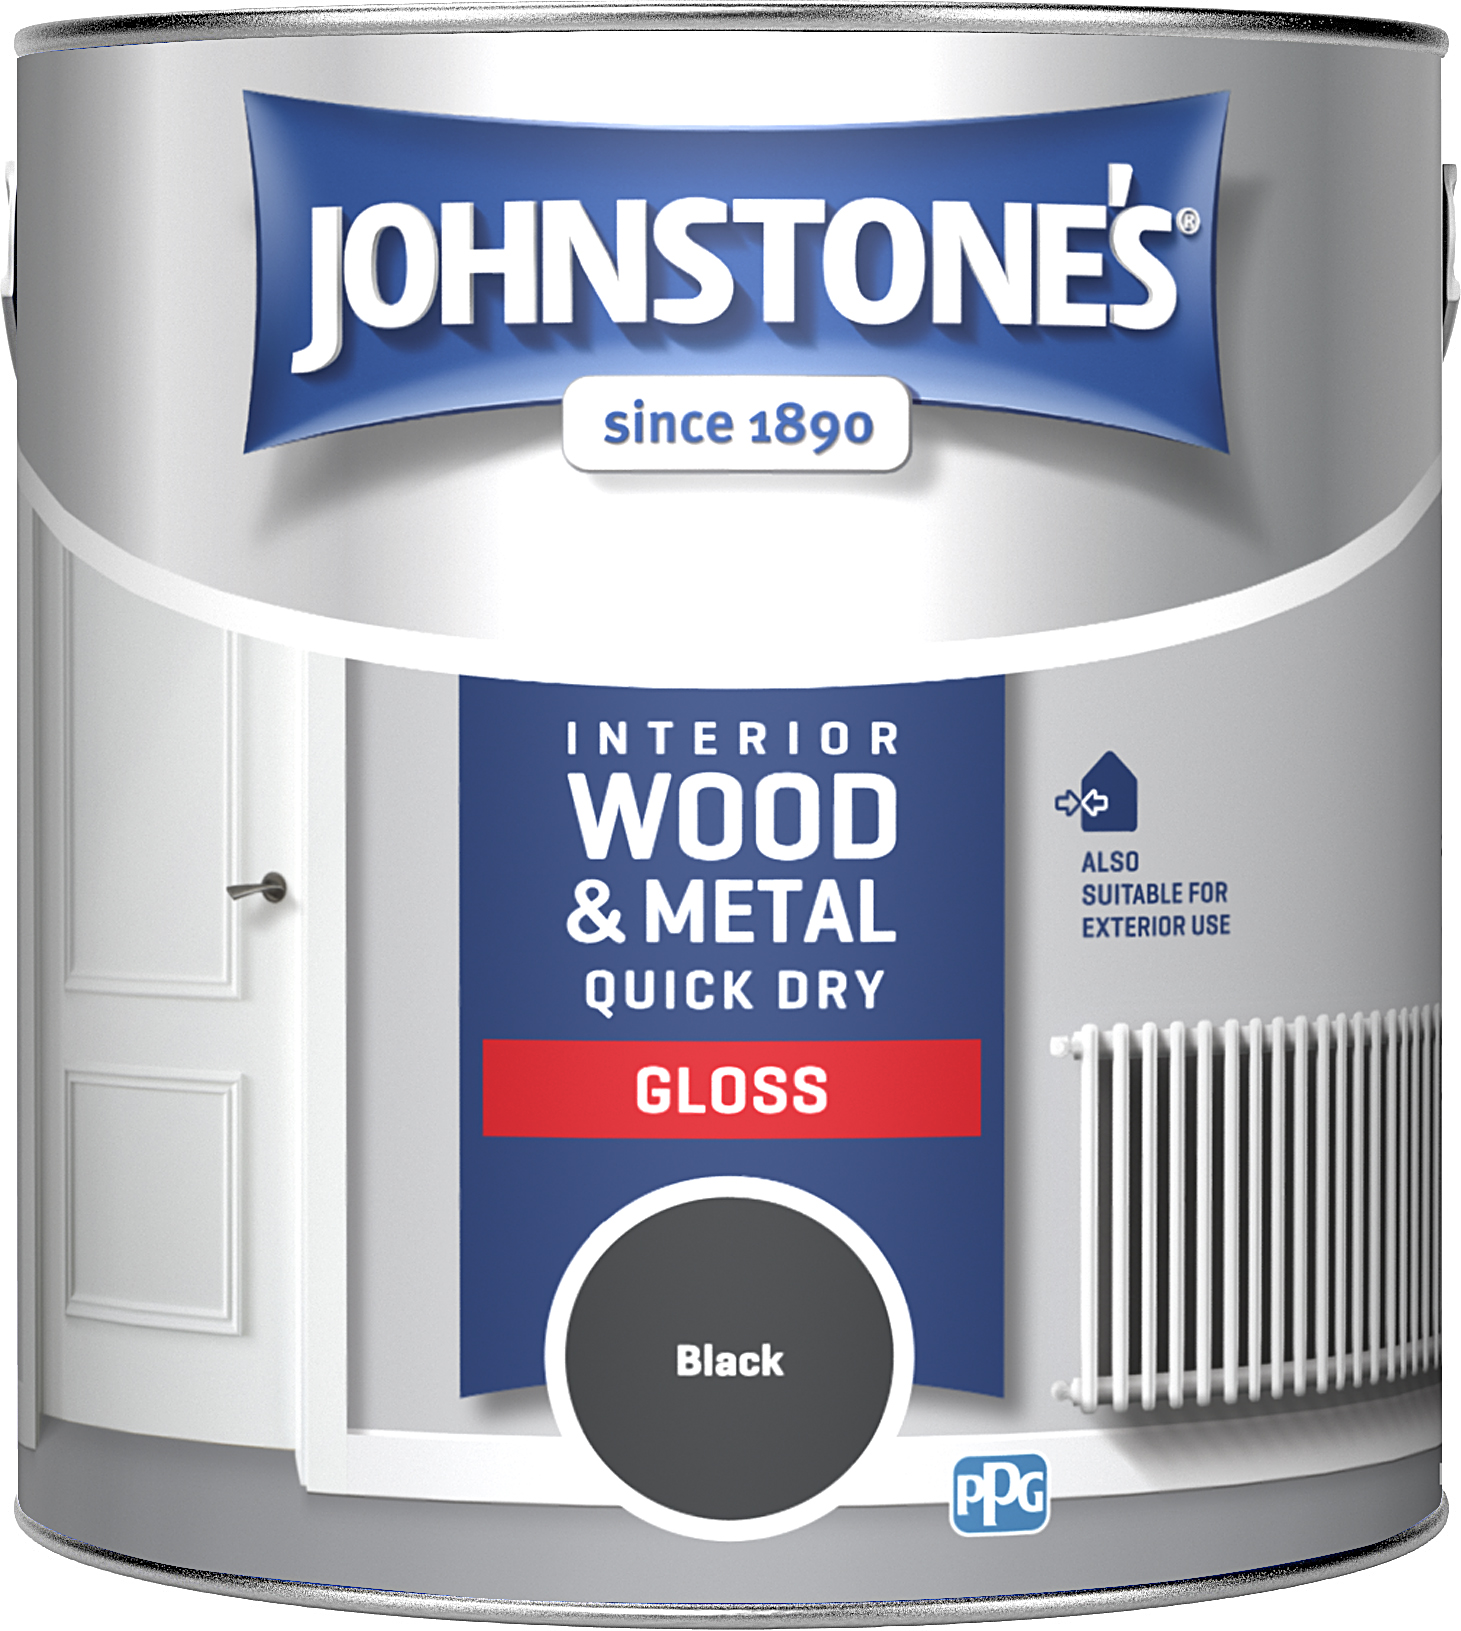 Johnstones 2.5 Litre Quick Dry Gloss Paint - Black